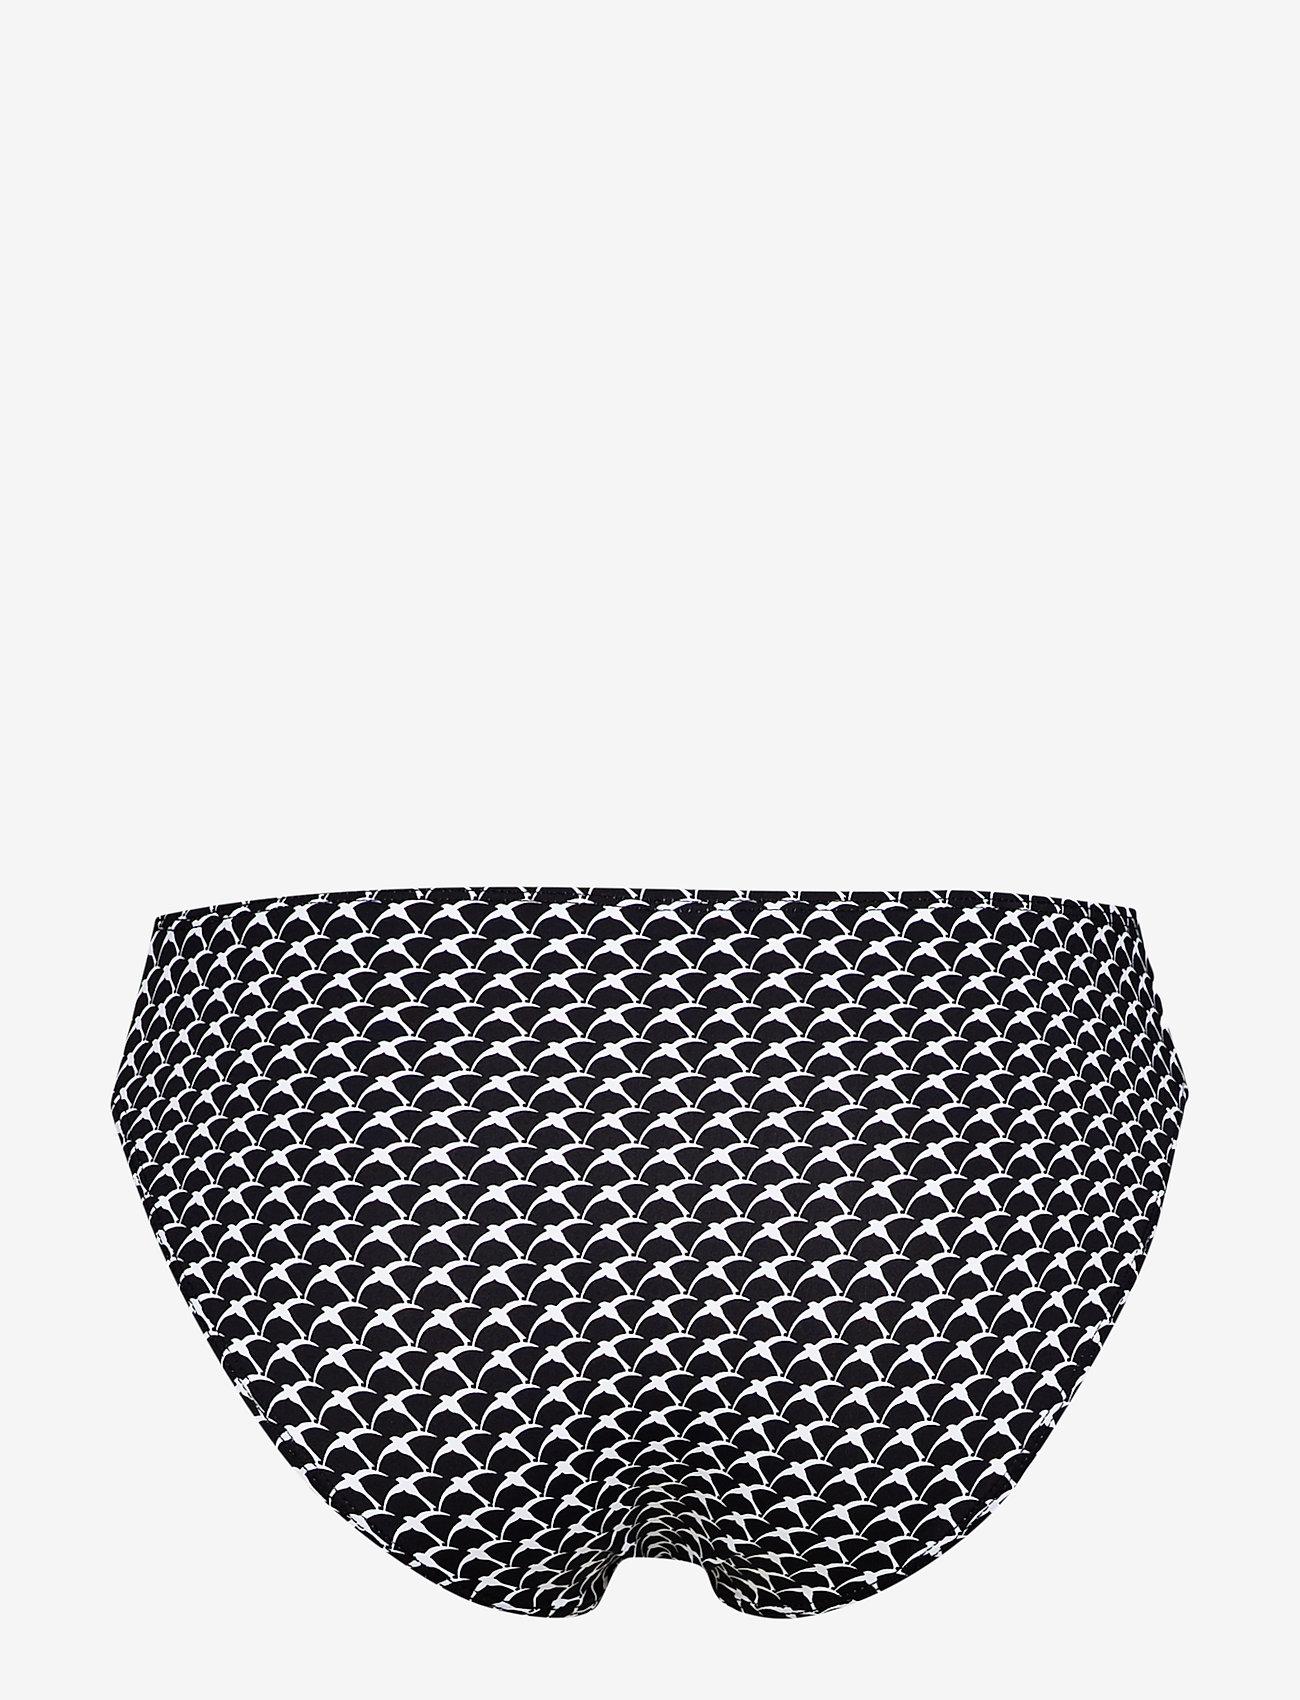 Esprit Bodywear Women - Beach Bottoms - bikinialaosat - black